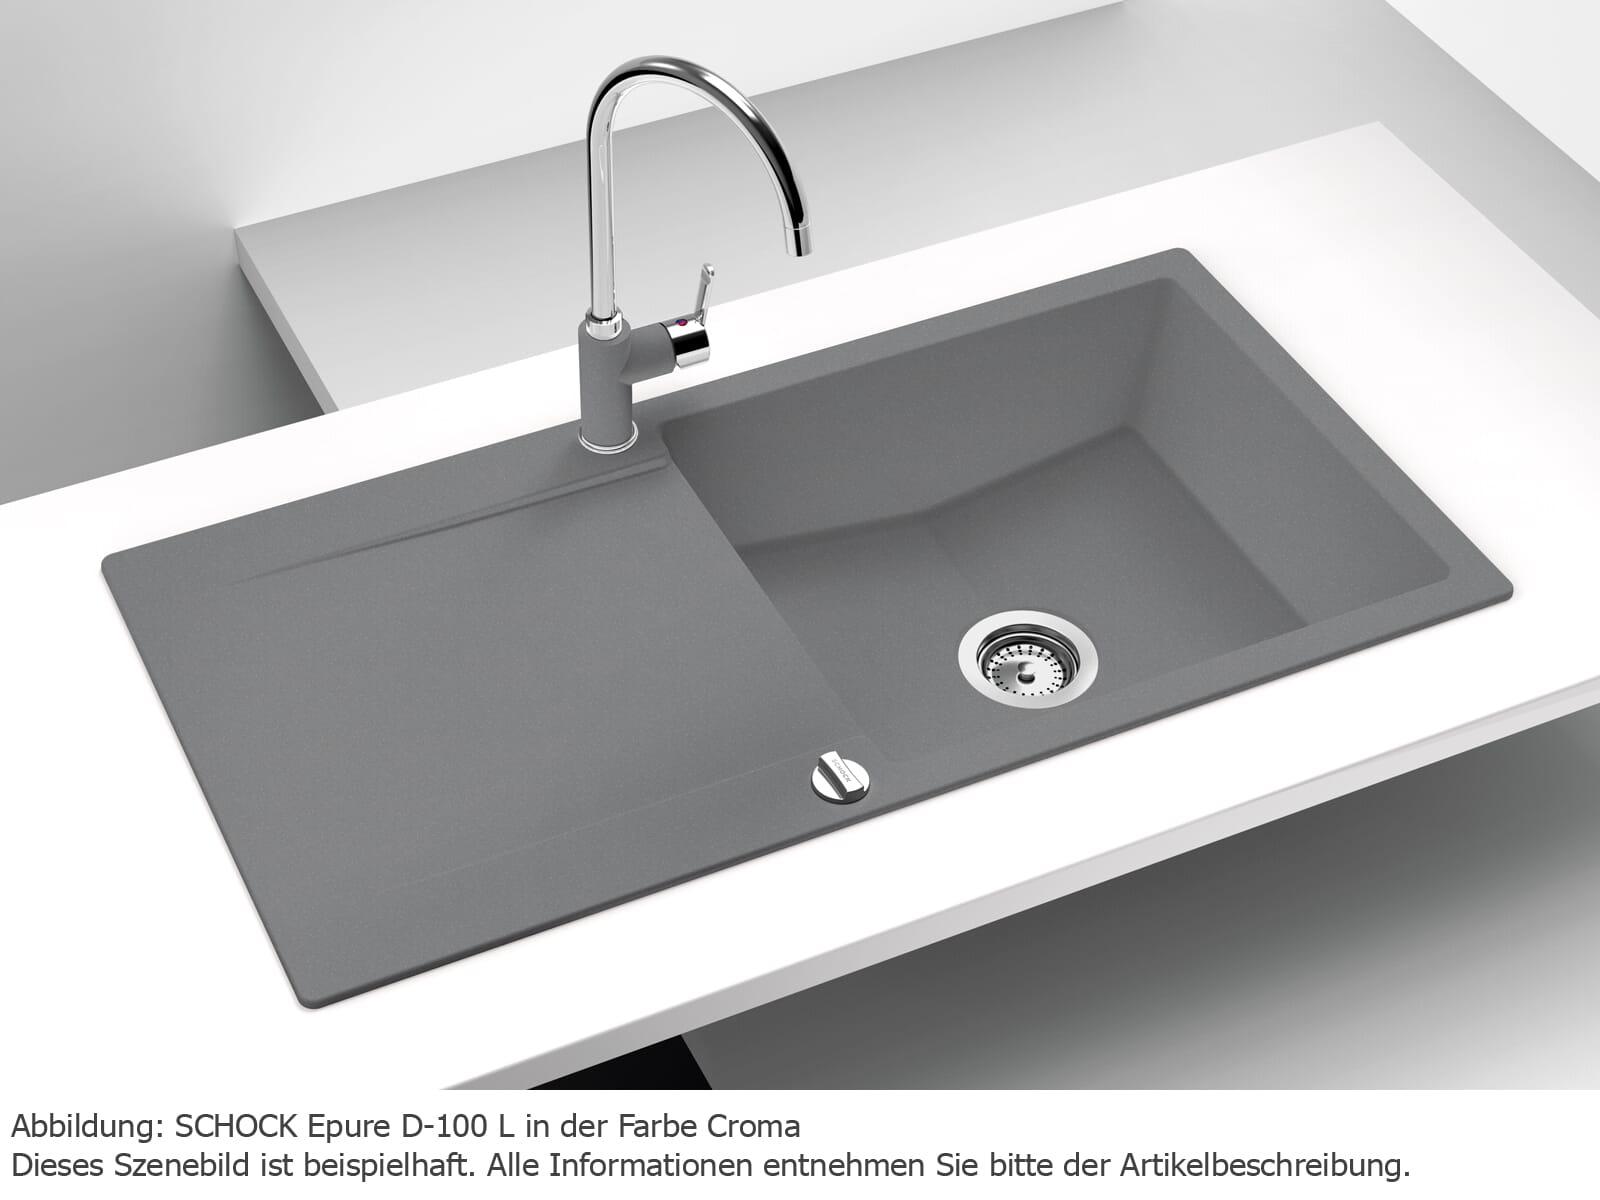 Schock Epure D-100 L A Roca - EPUD100LARCA Granitspüle